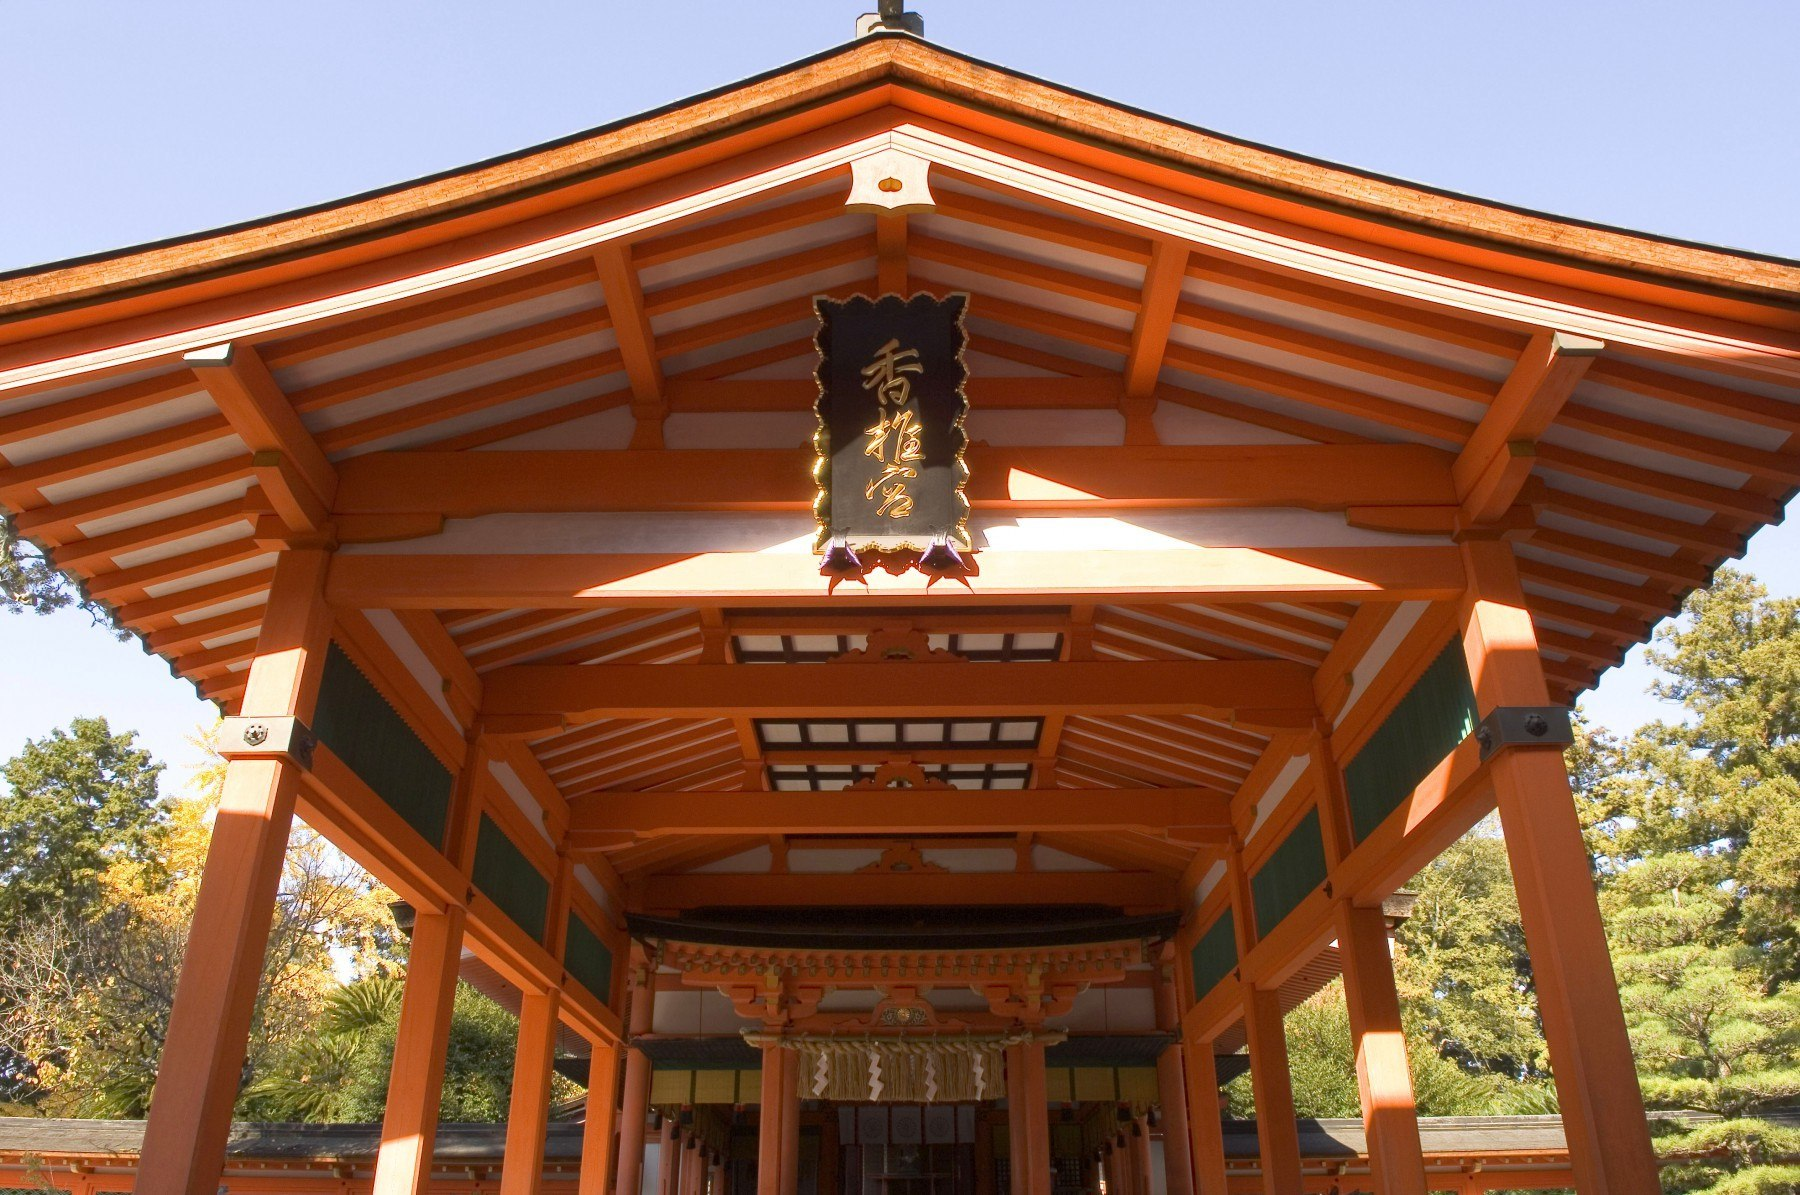 Image of Kashii Shrine(Photo taken: unknown)